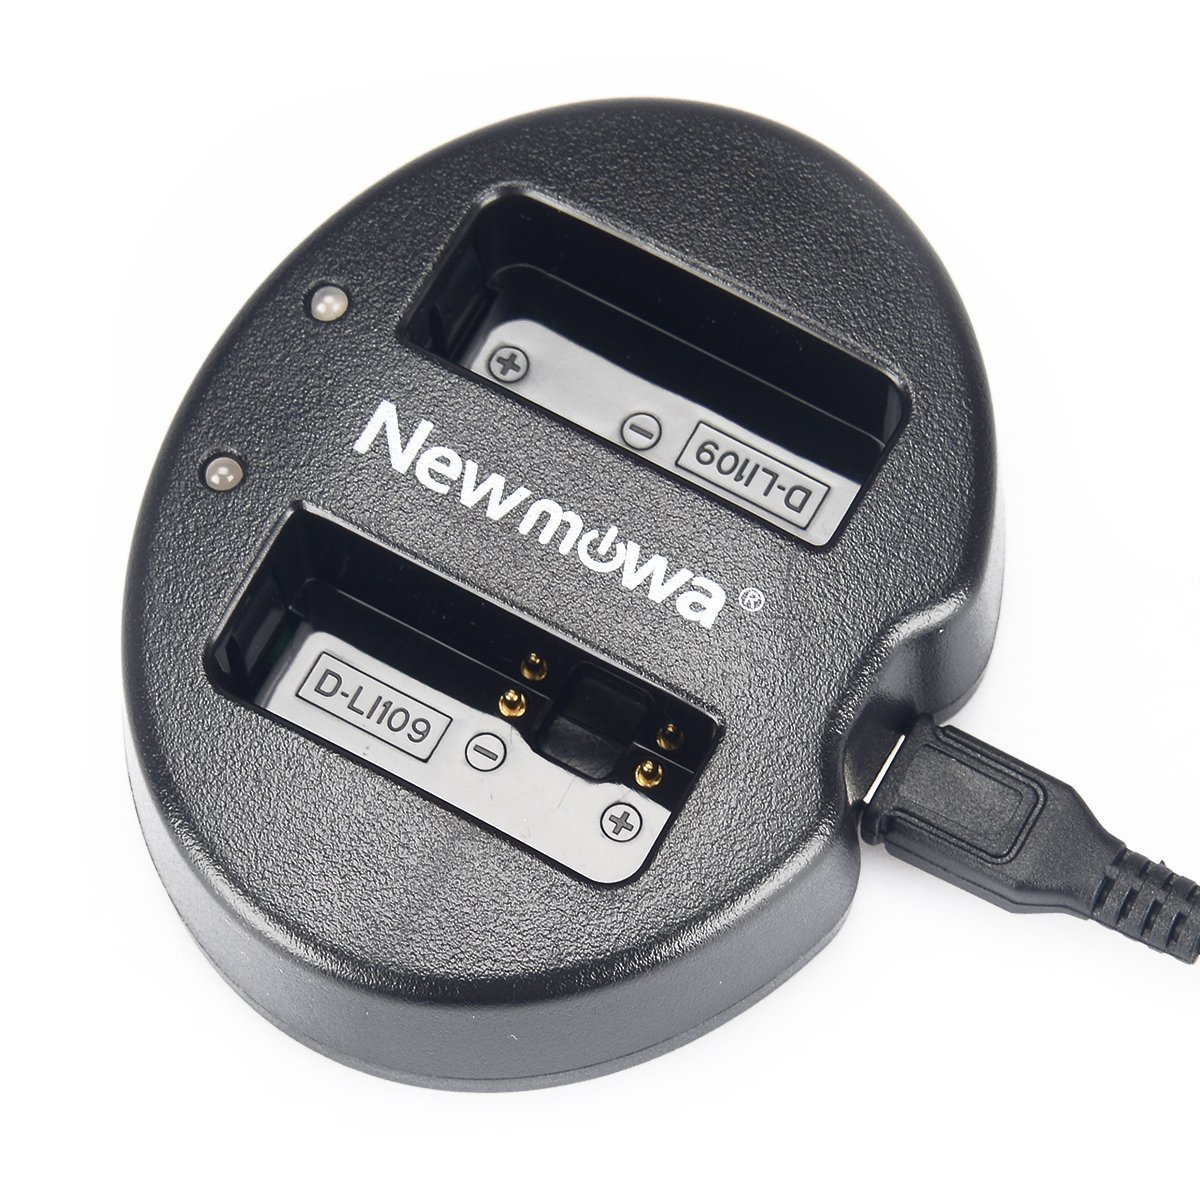 Newmowa Dual USB Charger for Pentax D-Li109 and Pentax K-R K-30 K-50 K-500 K-S1 K-S2